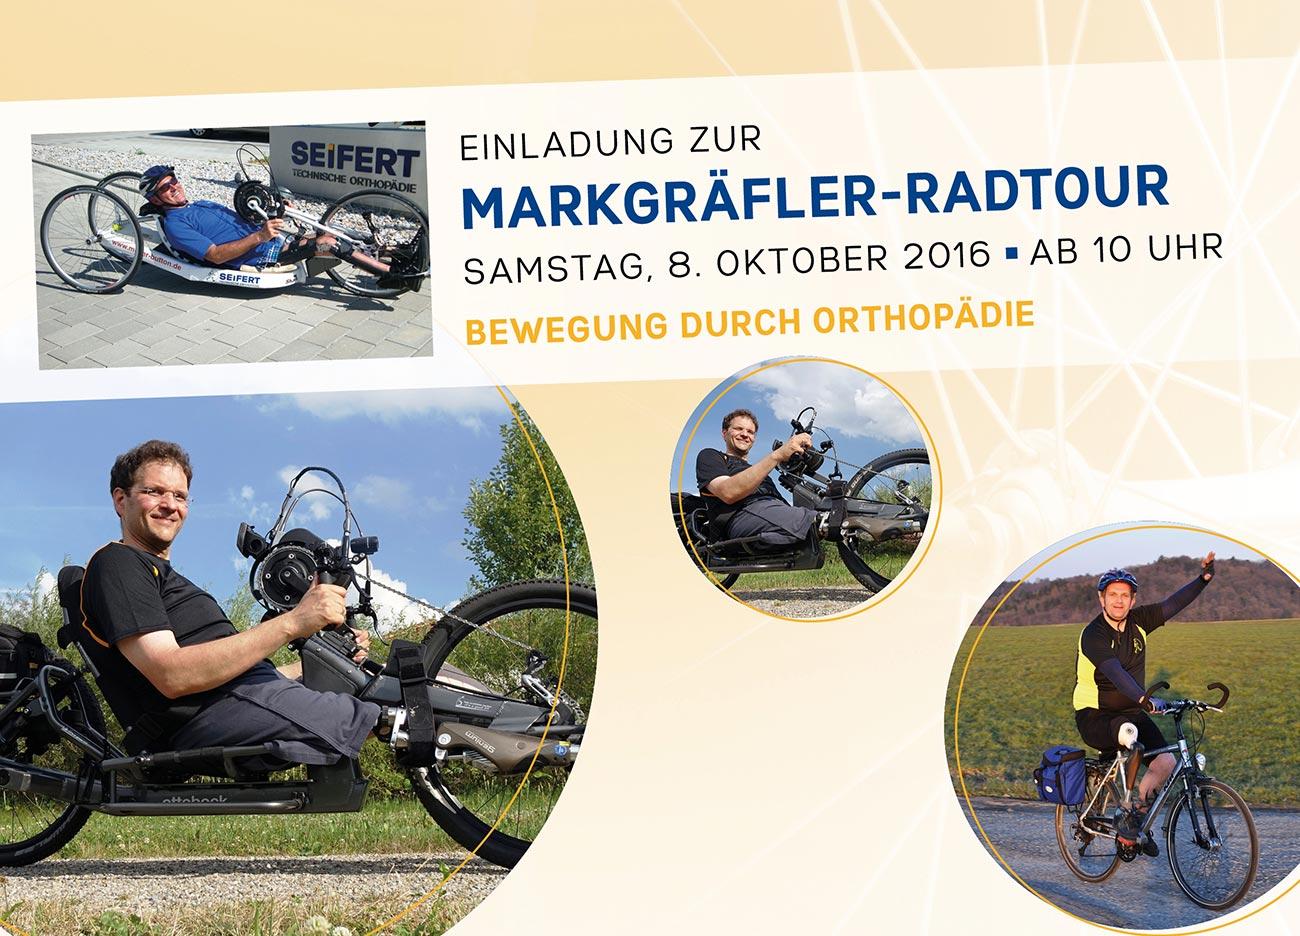 markgraefler-radtour-2016